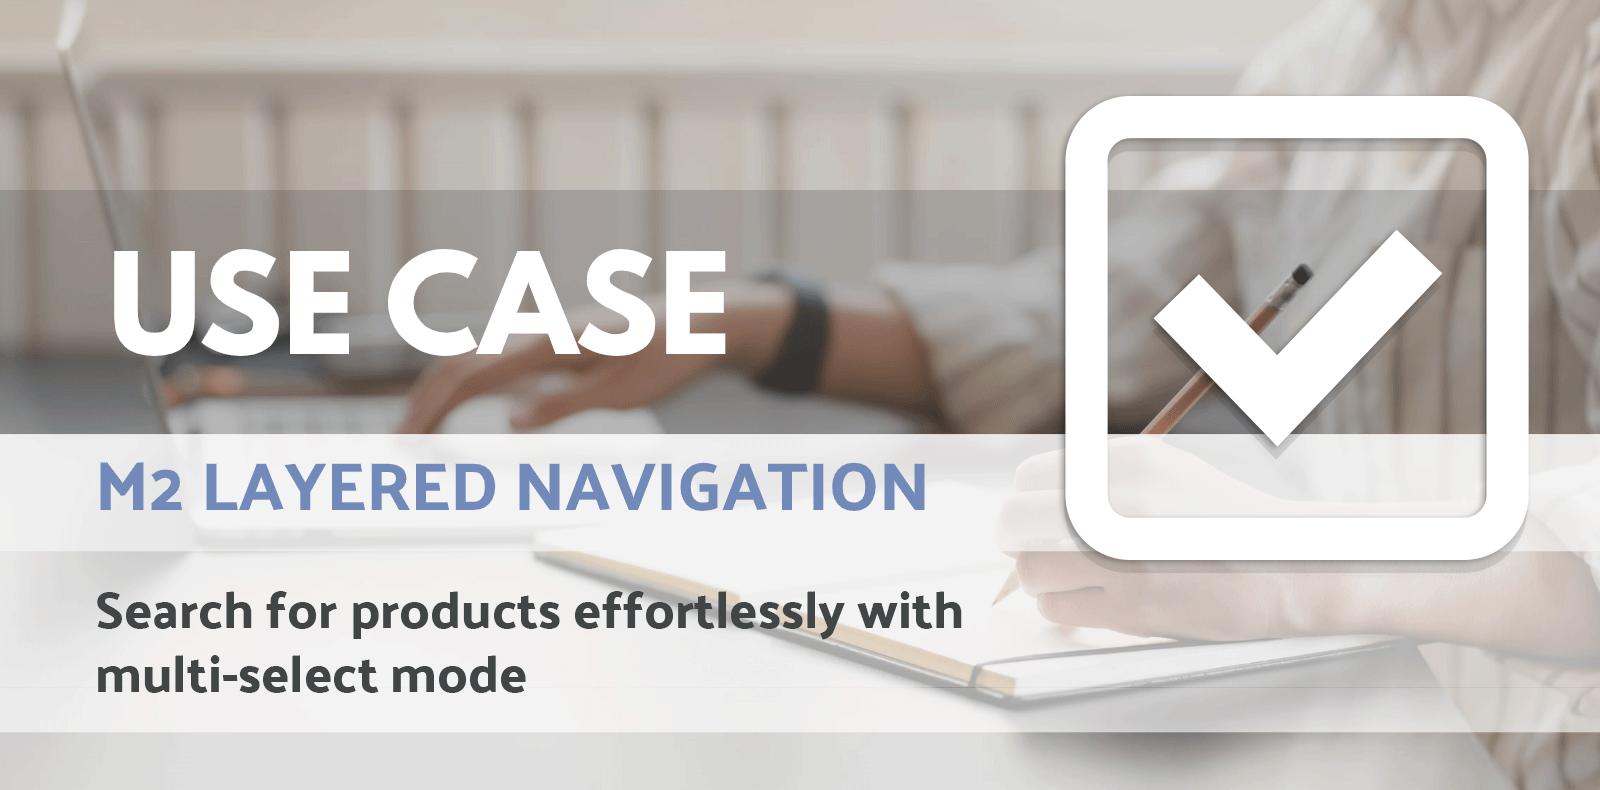 Magento 2 Layered Navigation: Use Case